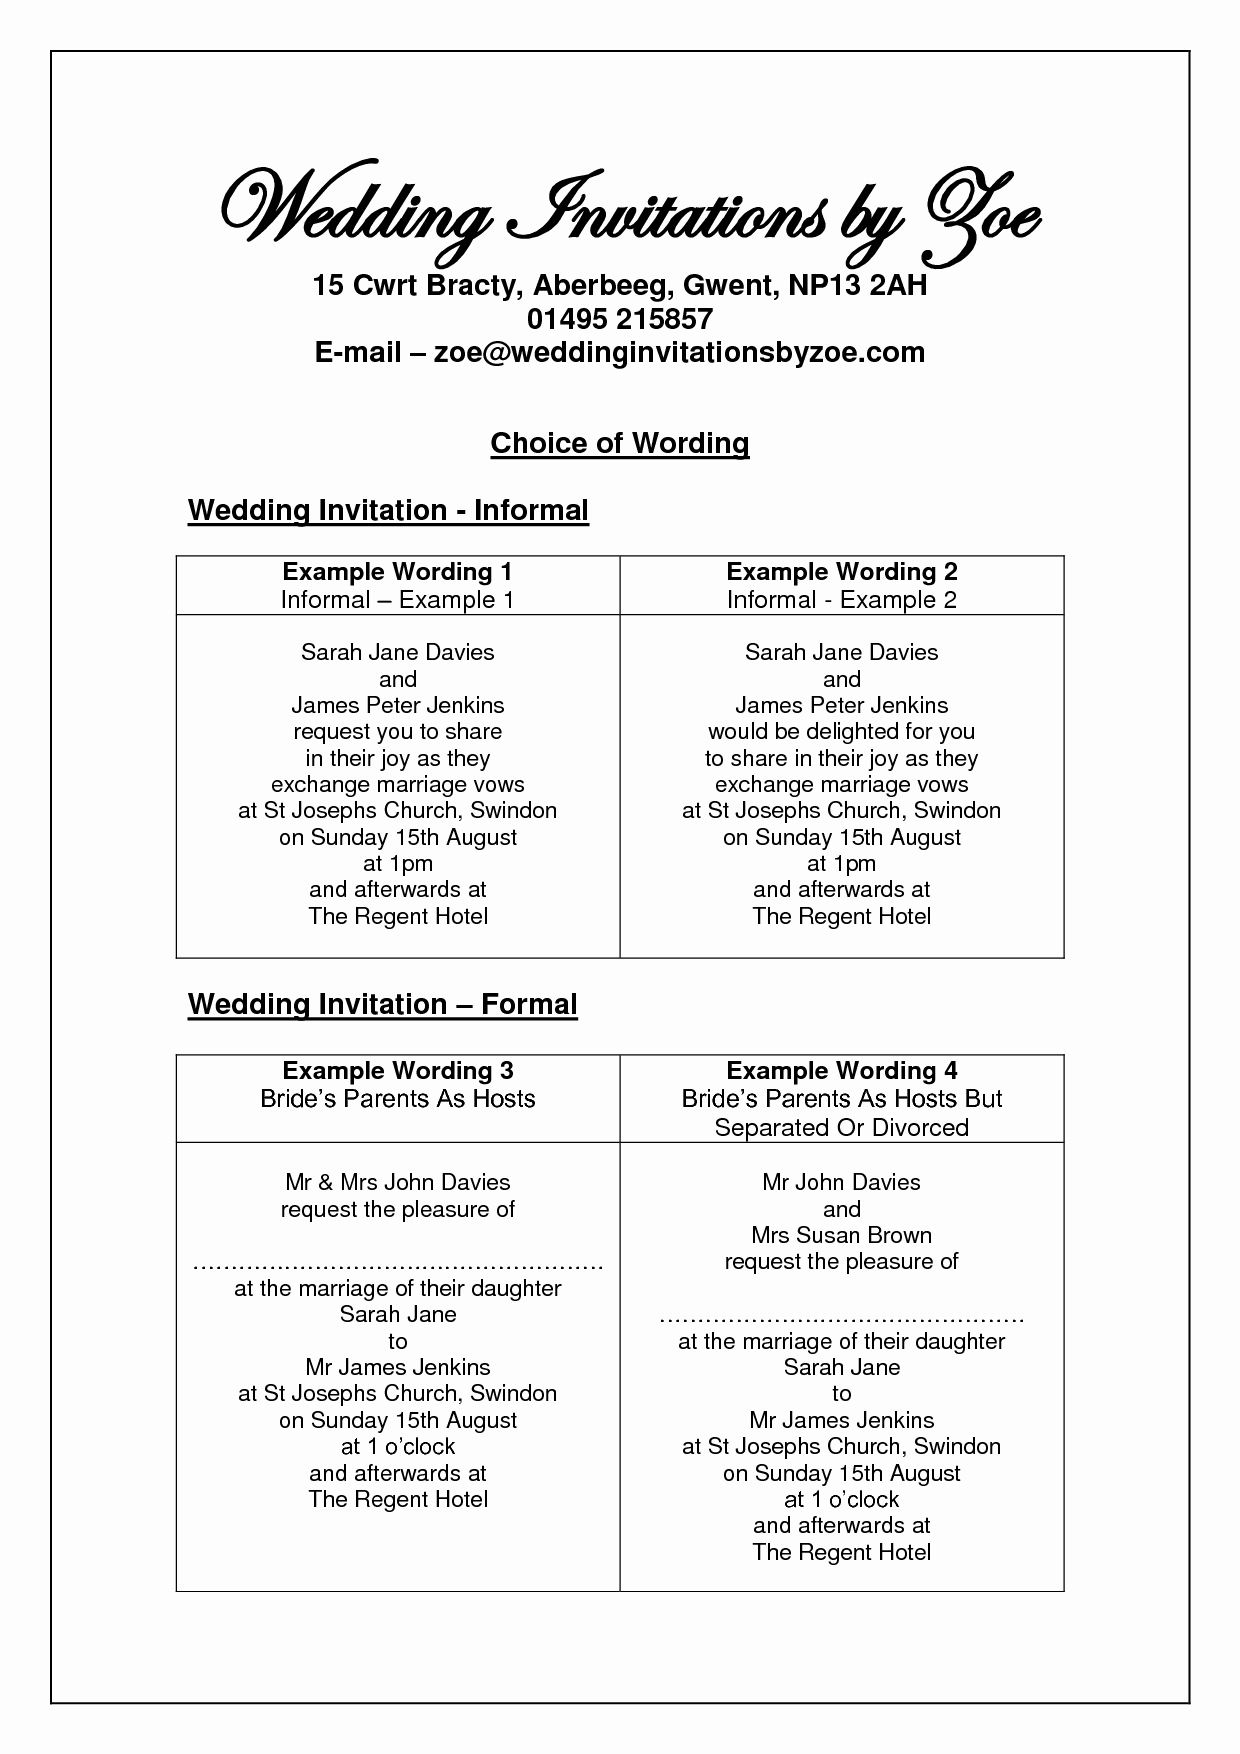 Informal Wedding Invitation Wording New Informal Wedding Invitation Wording Google Search